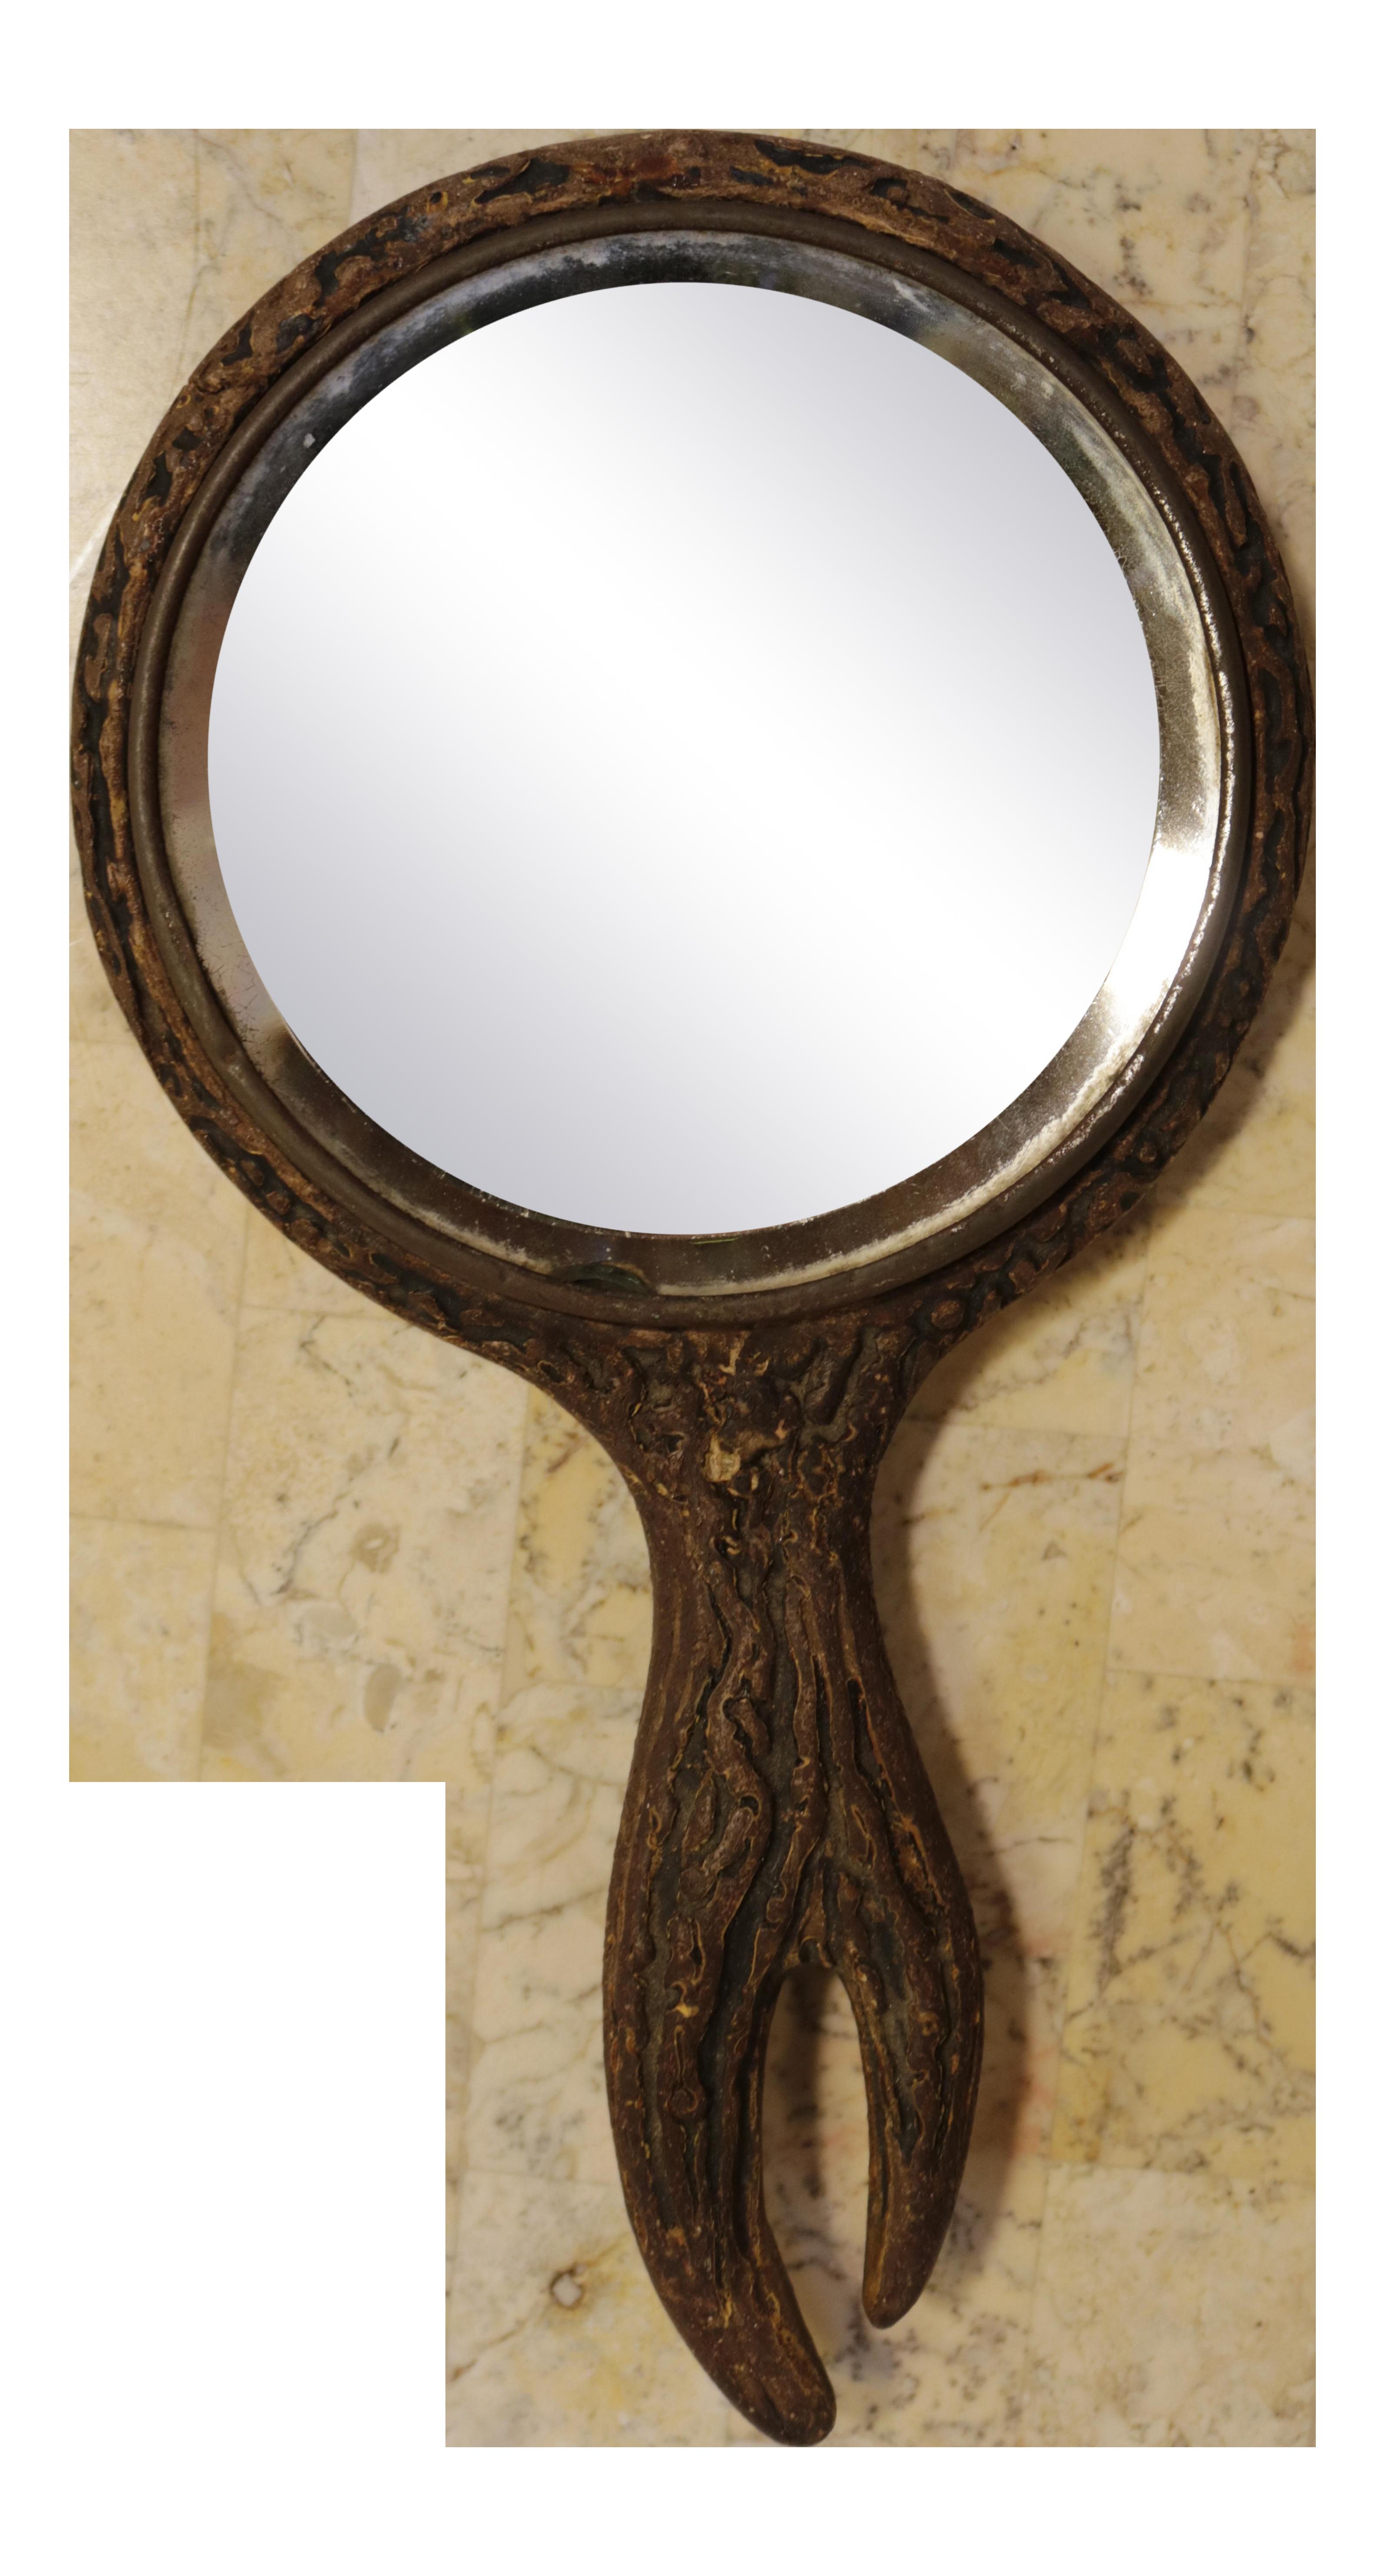 Amazon.com: Luxor Salon Mirrors - Hand Held Paddle Mirror / 9